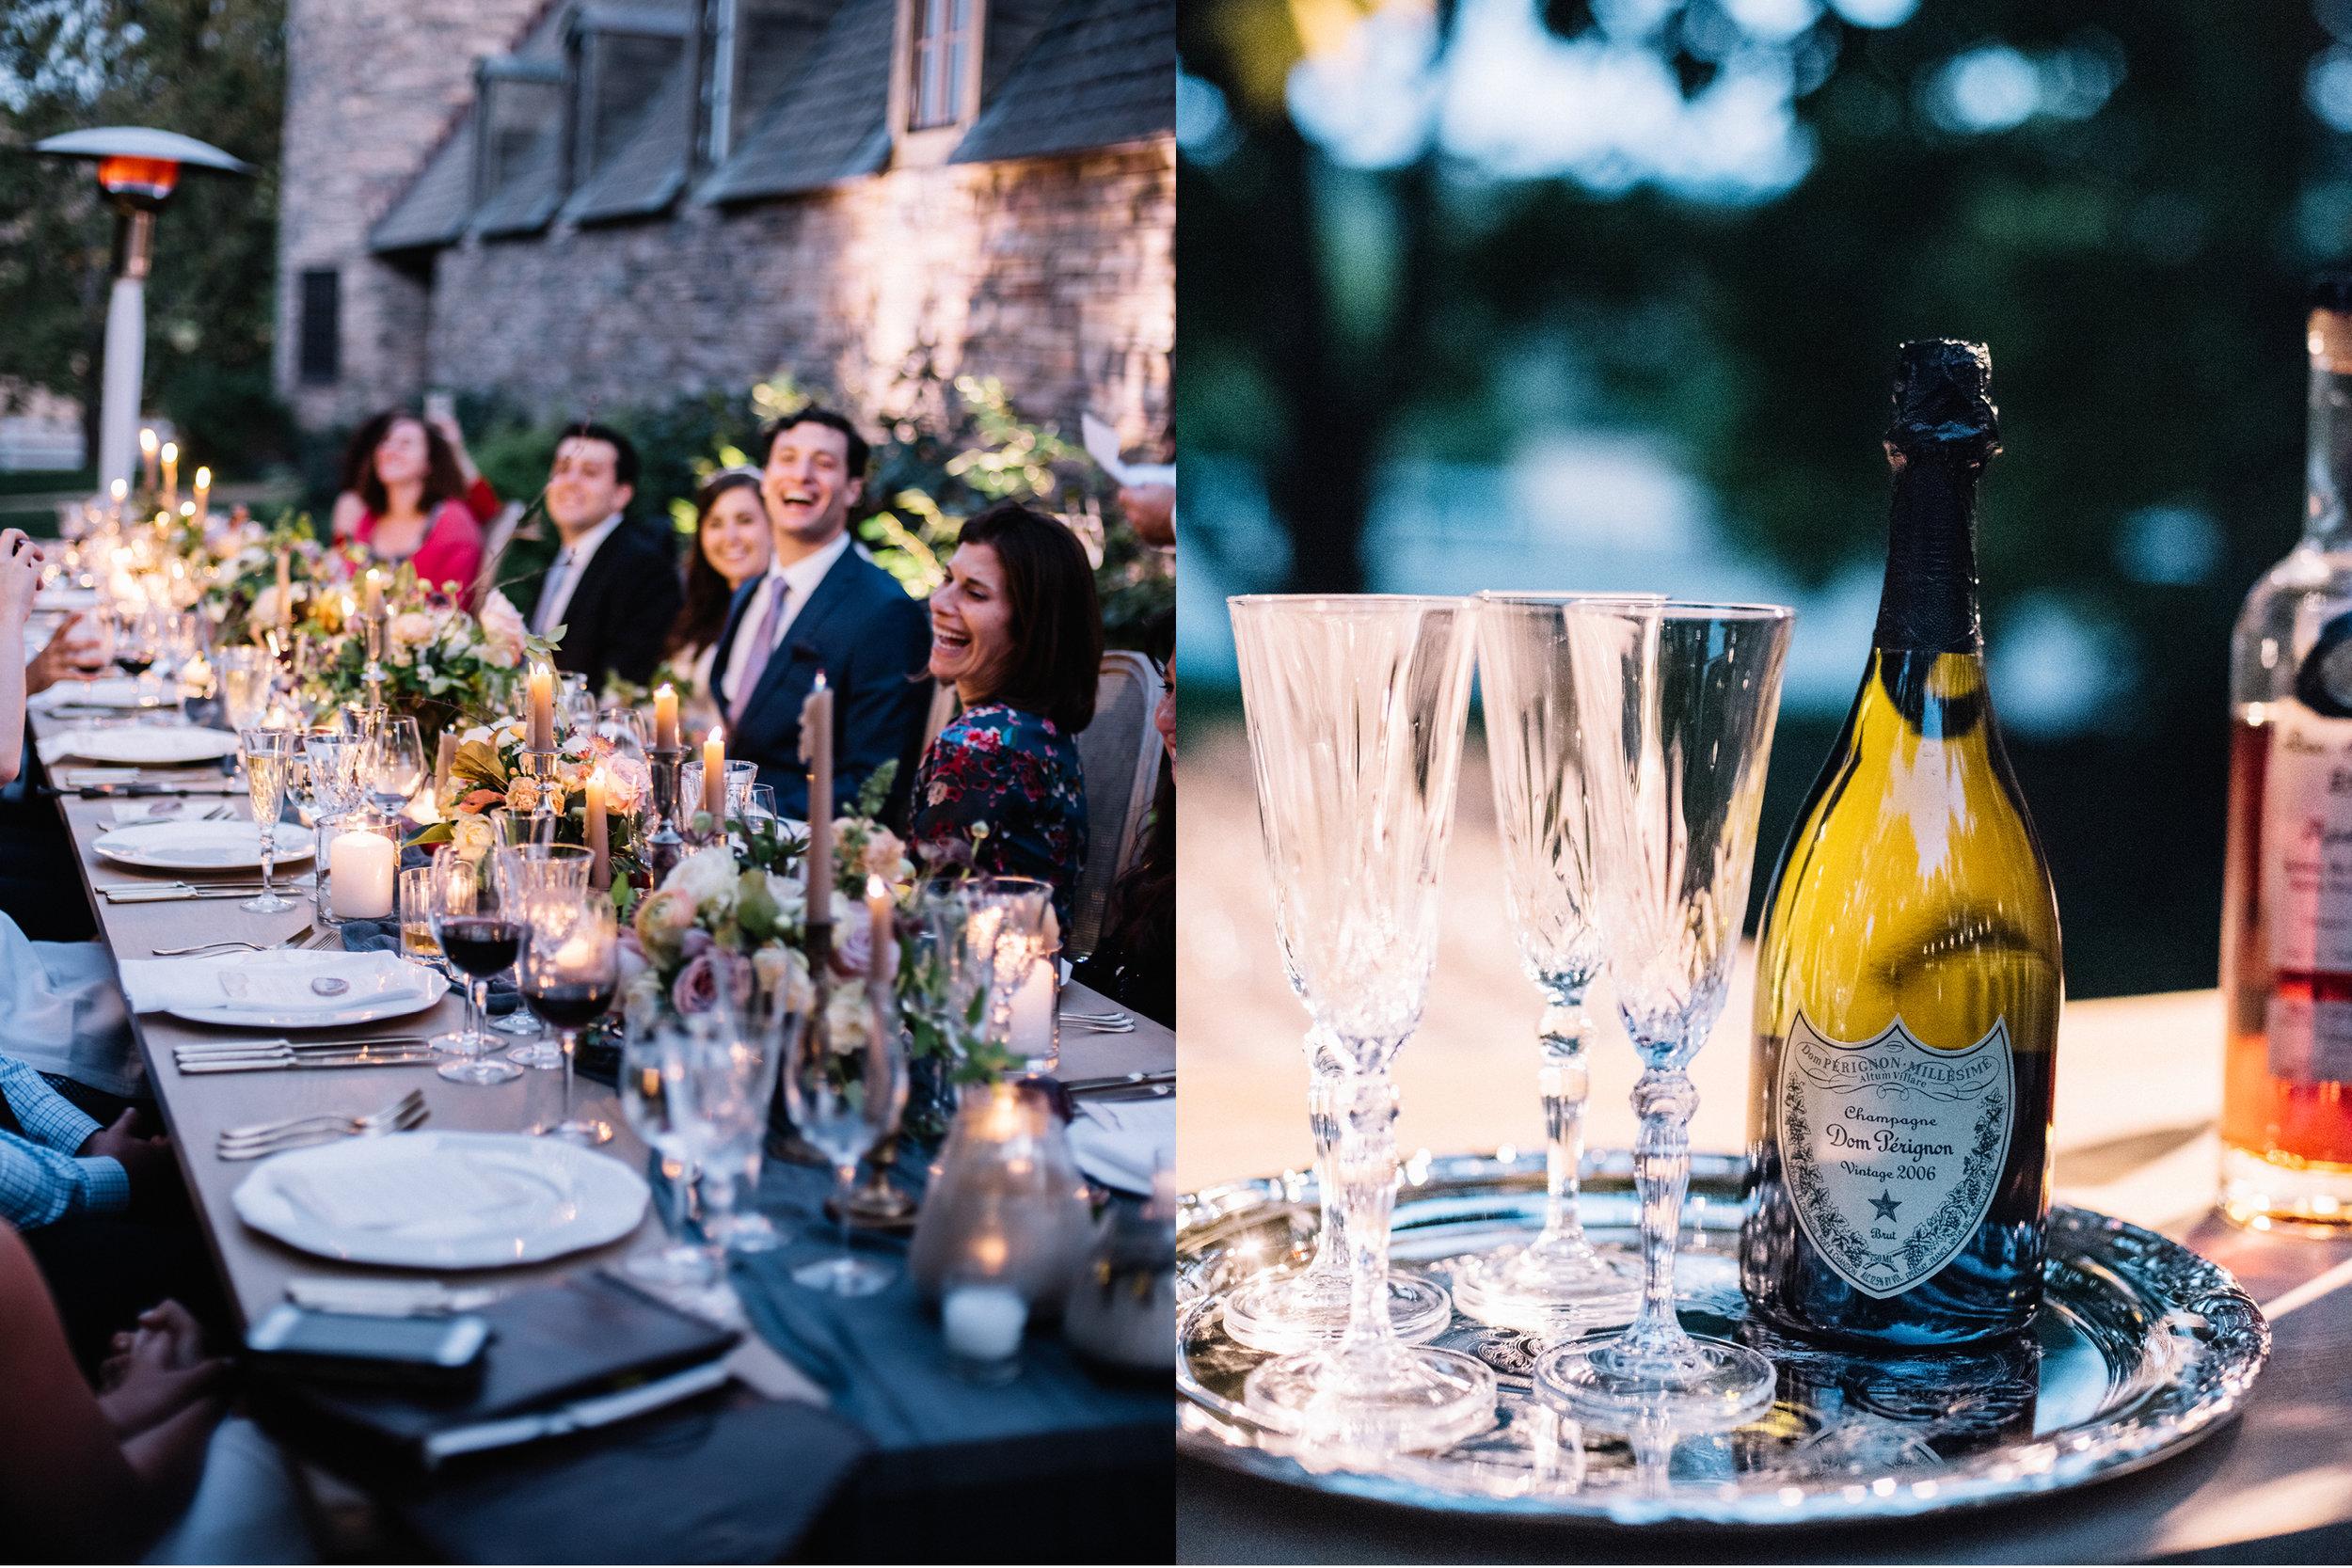 santa-barbara-elopement-elope-wedding-planner-planning-coordinator-day-of-intimate-event-design-kestrel-park-santa-ynez-english-country-estate-garden-castle (37).jpg